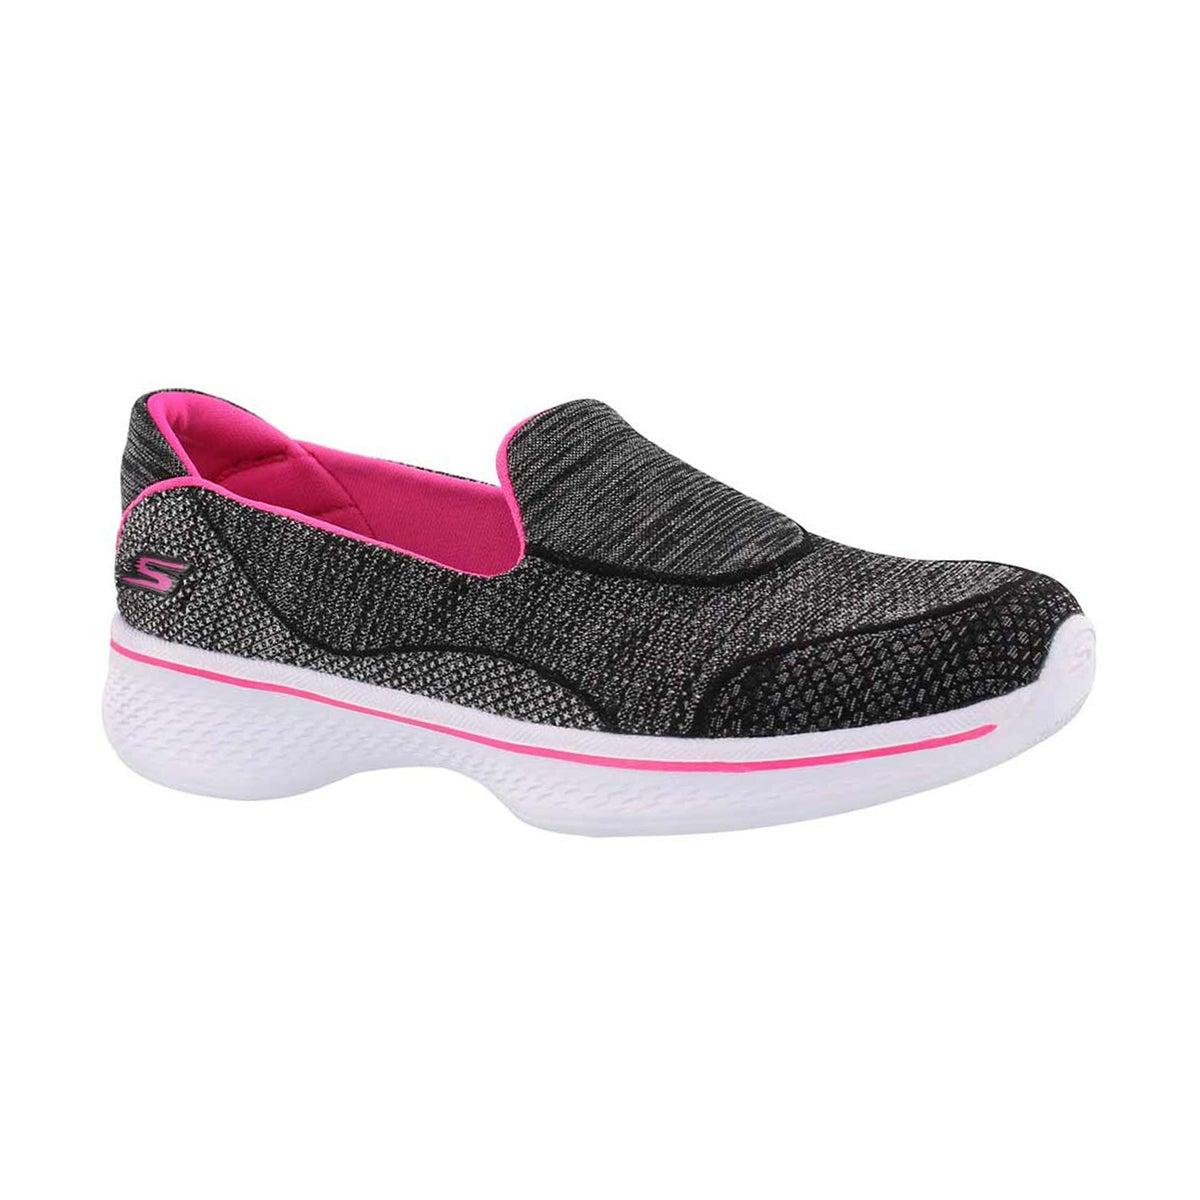 Girls' GOwalk 4 SPEEDY SPORTS black/pink slip ons